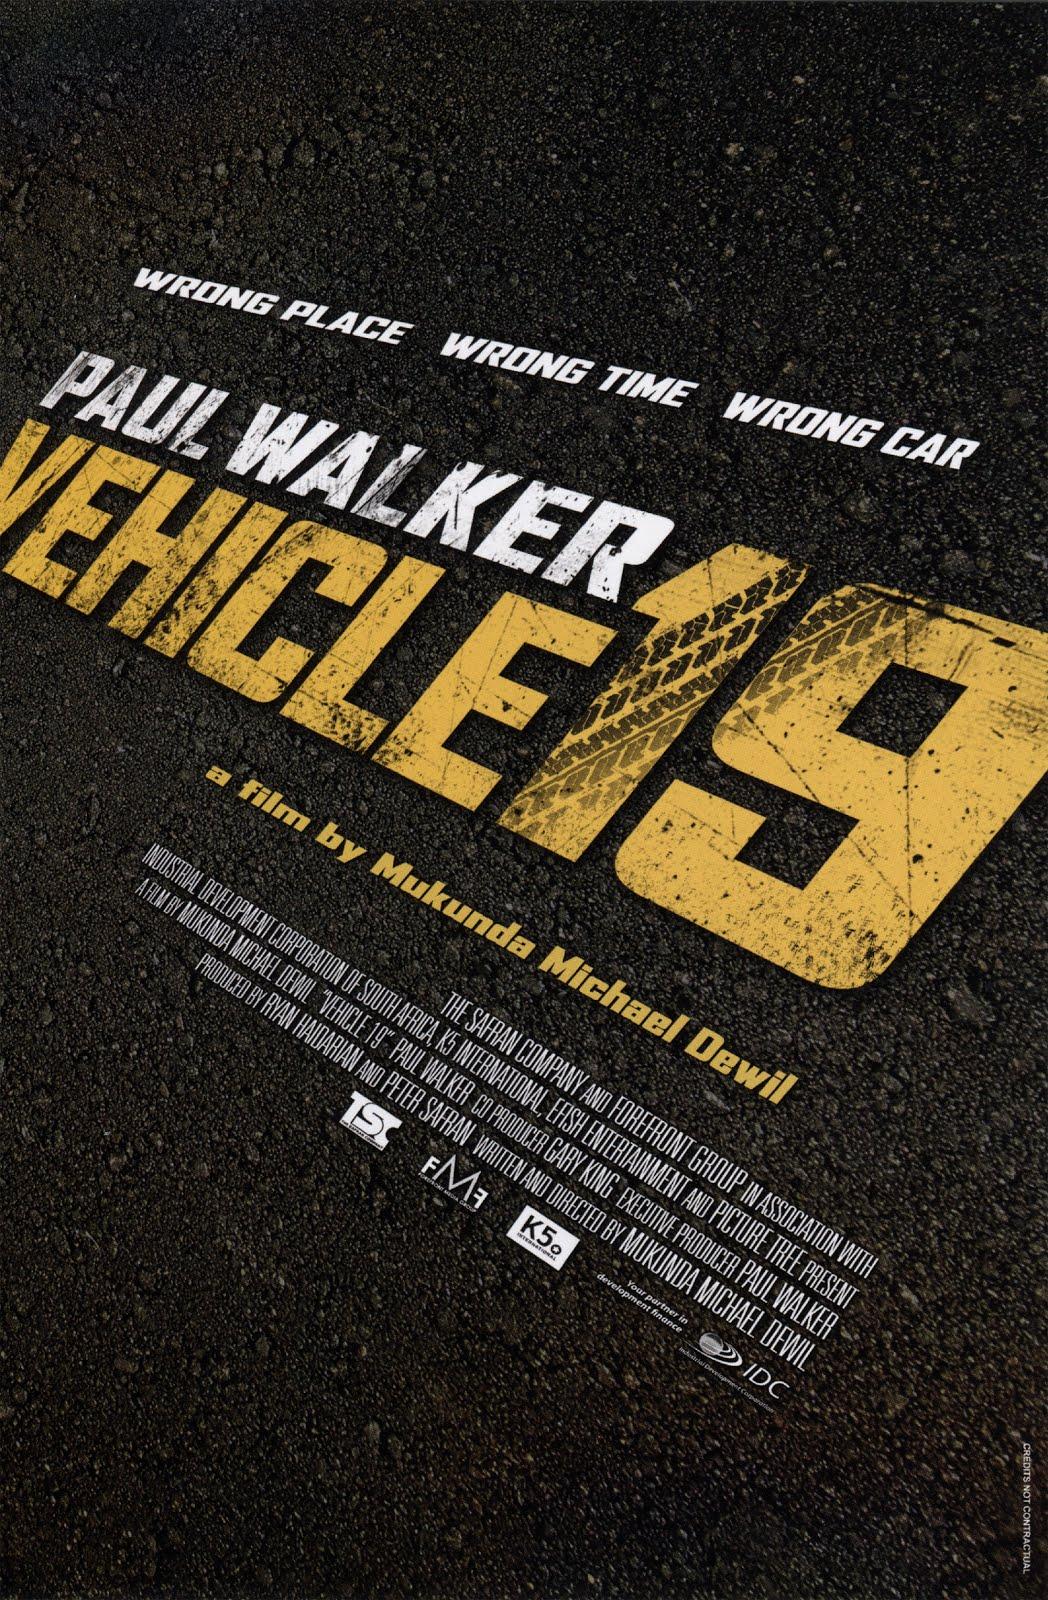 http://2.bp.blogspot.com/-9v4KbodLosQ/UPQDMDkHlgI/AAAAAAAAAHc/3hIpRSt5iL8/s1600/vehicle-19-teaser-poster.jpg